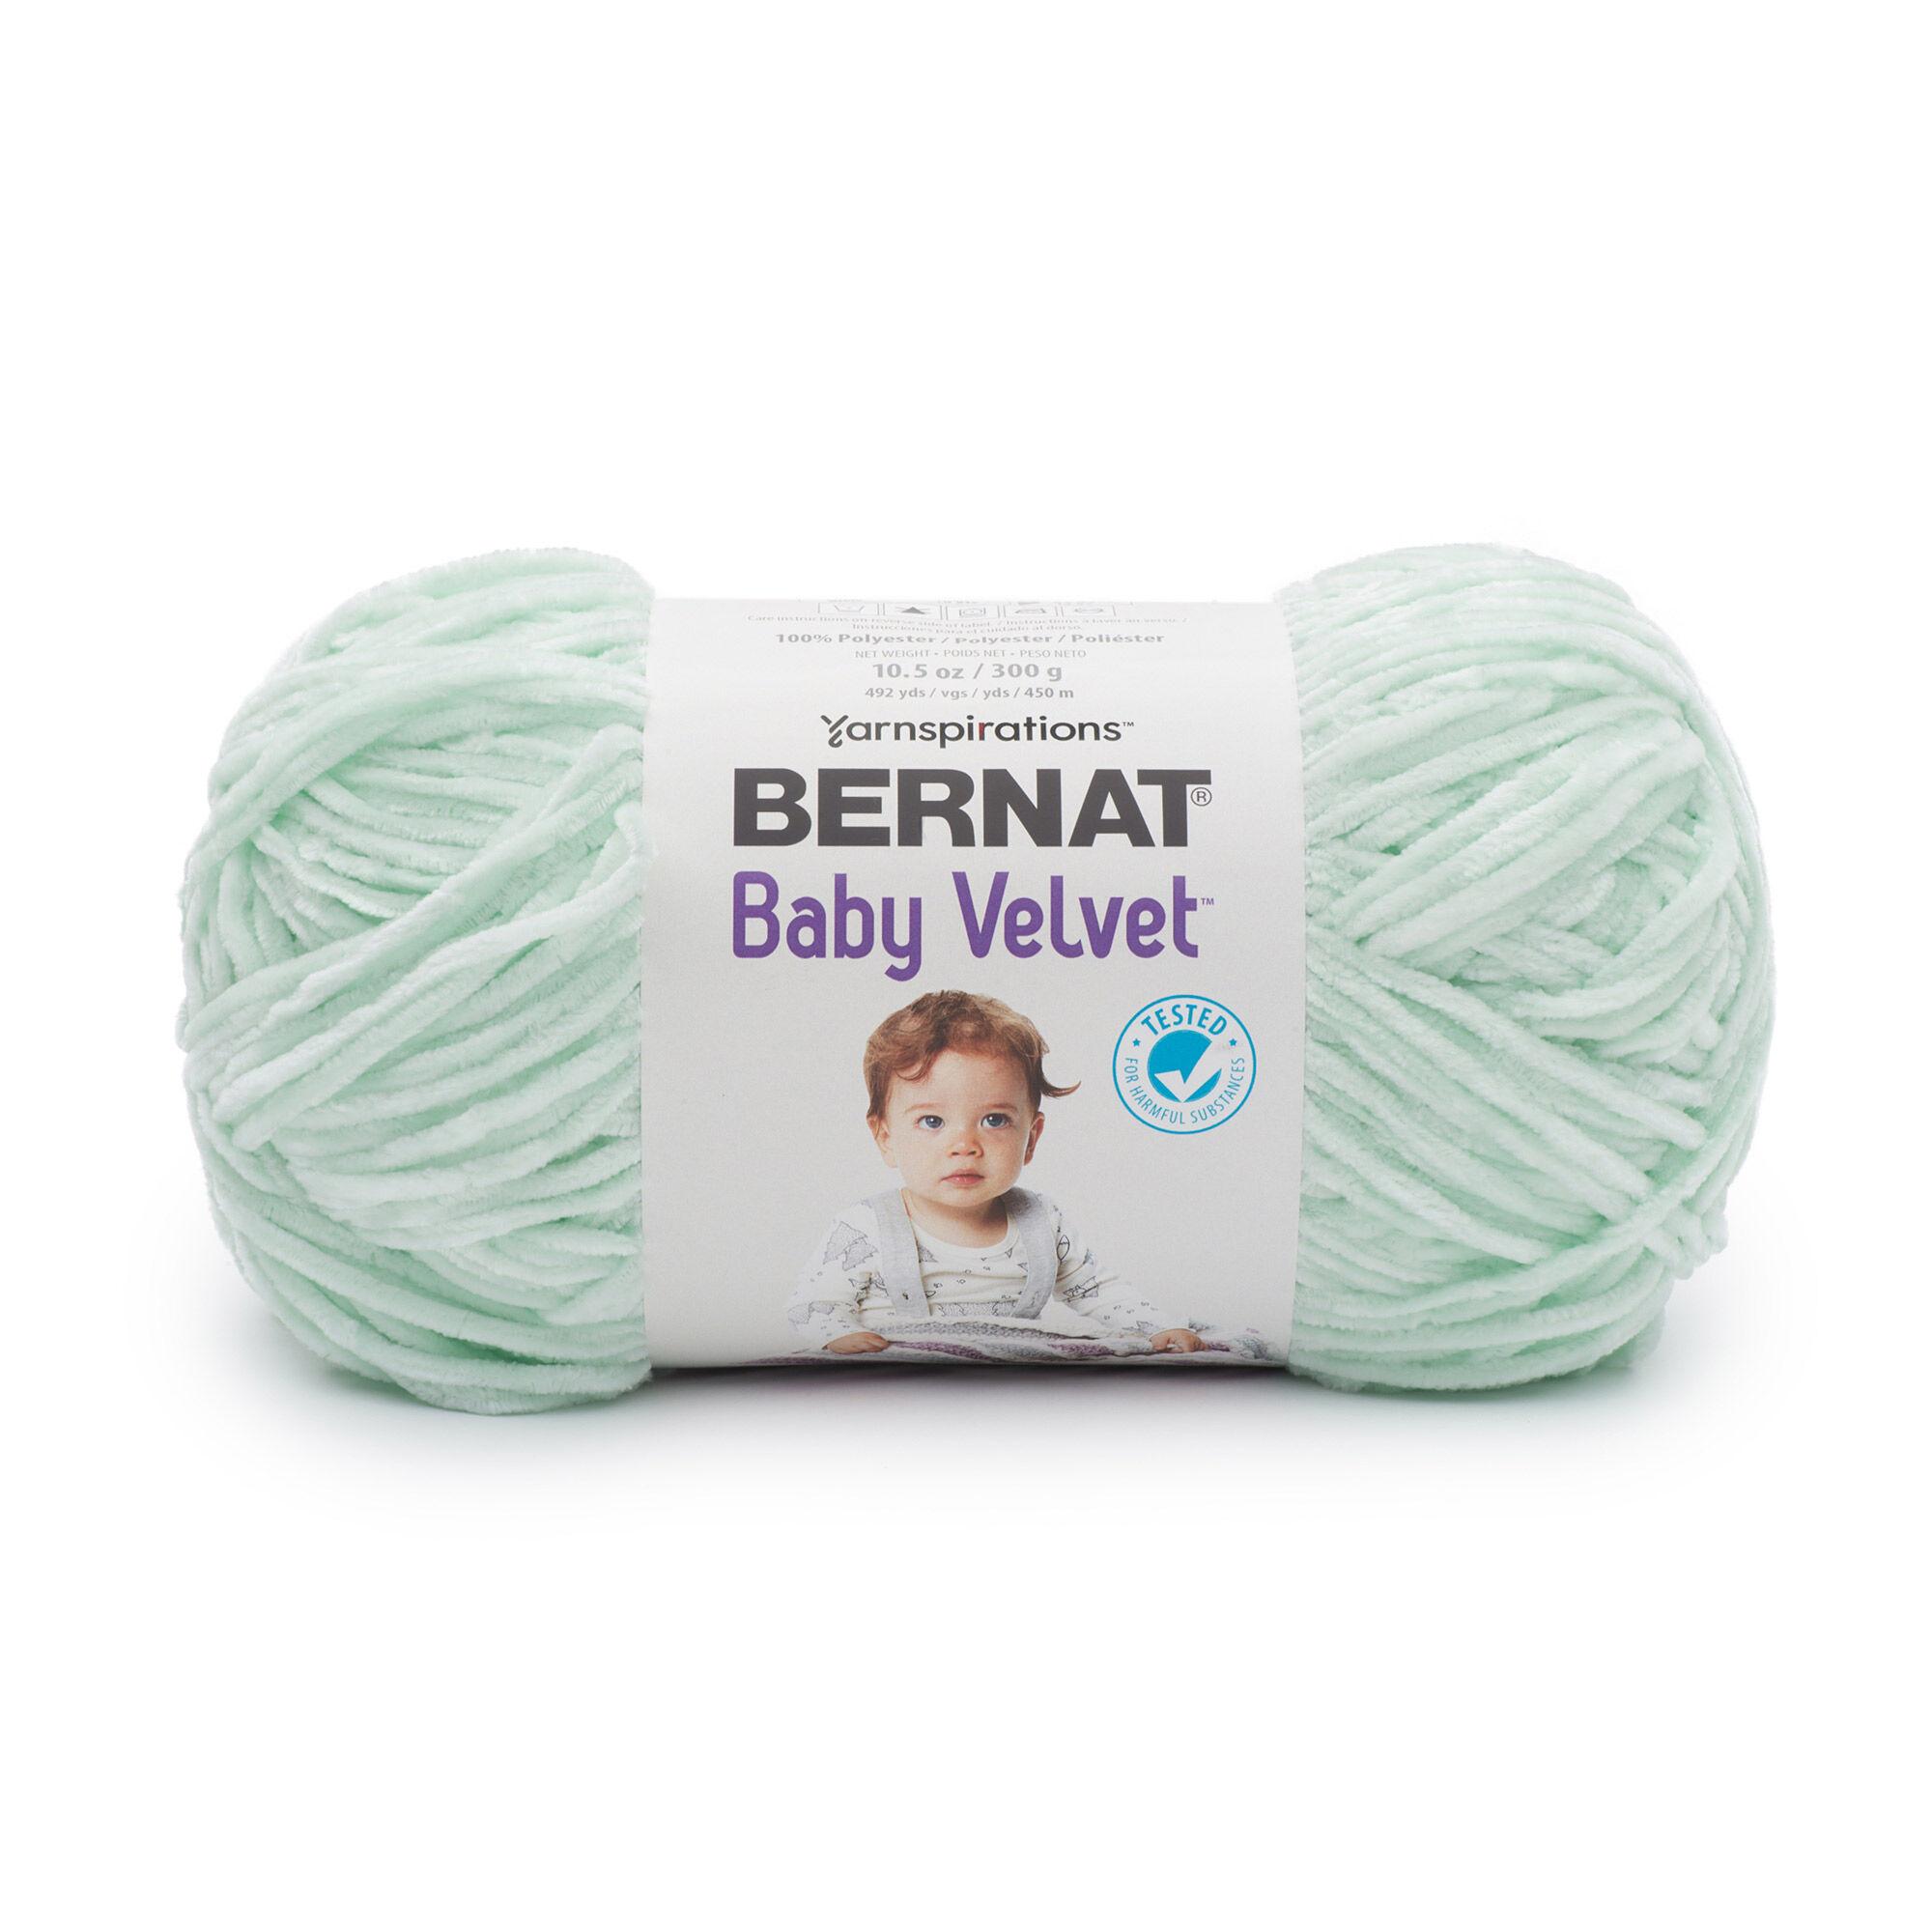 Bernat Baby Velvet Yarn, Seafoam | Yarnspirations